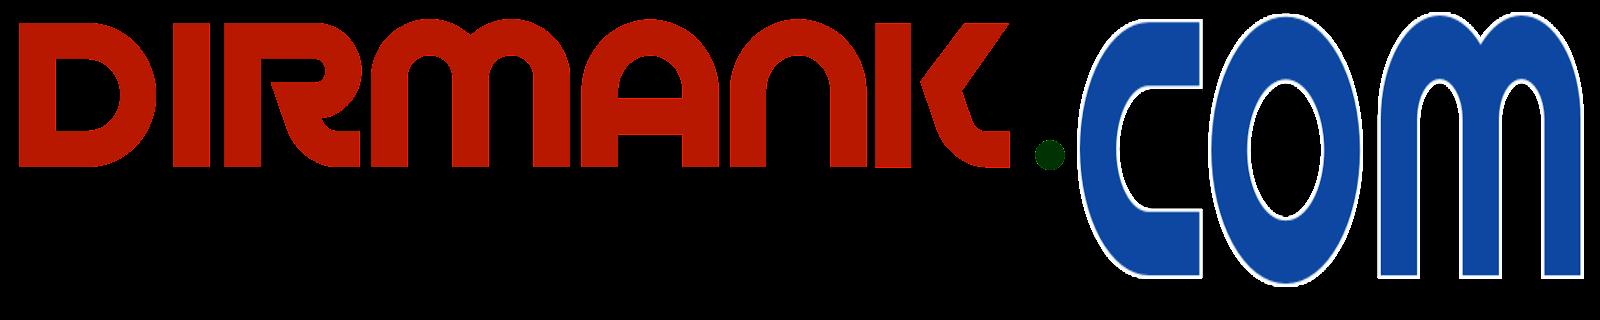 dirmank.com